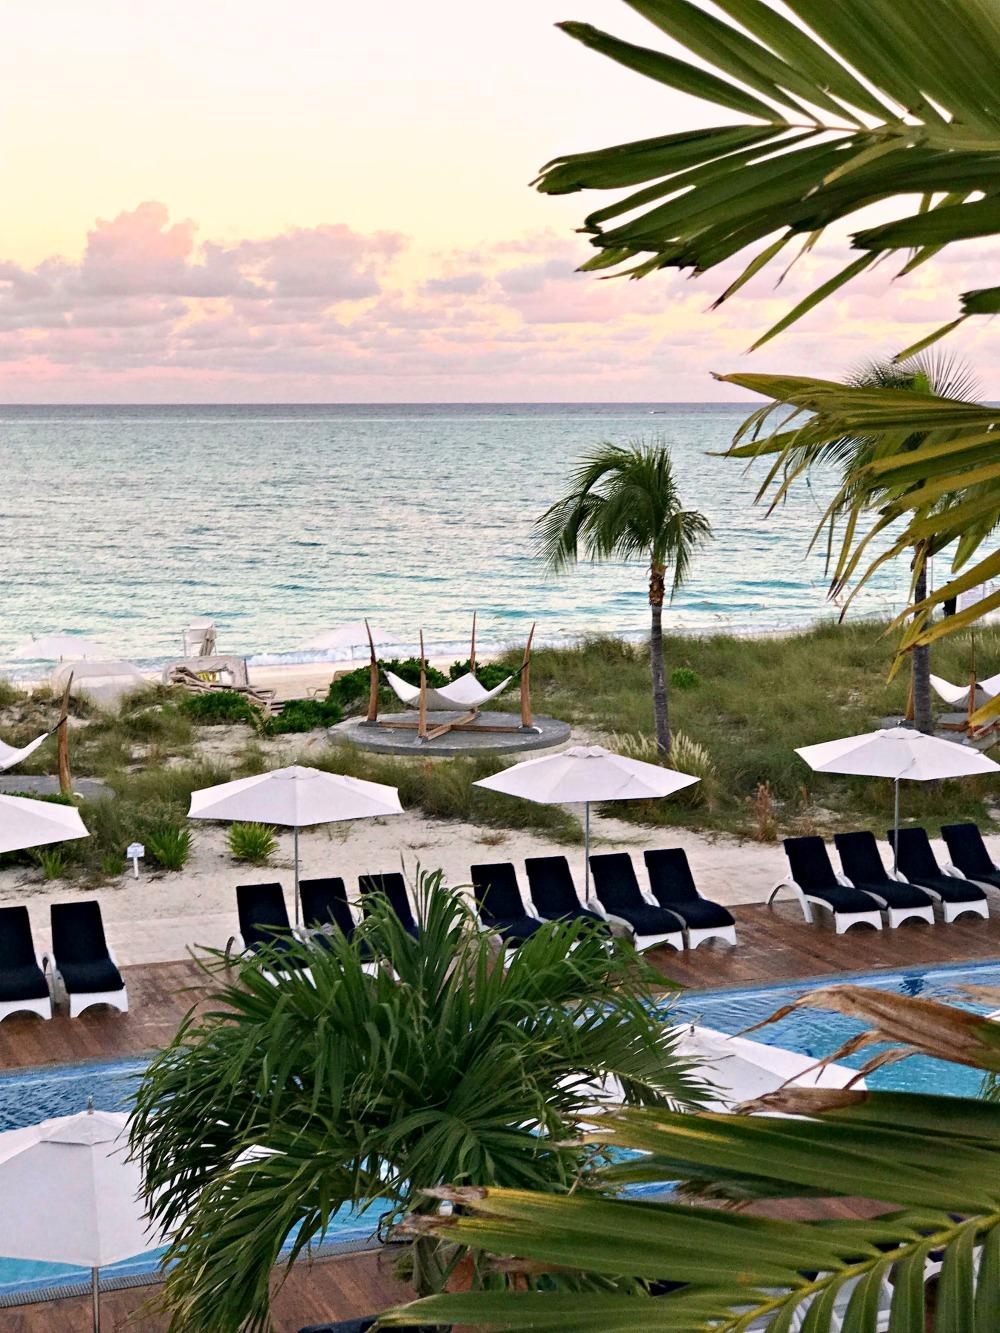 beaches resort location